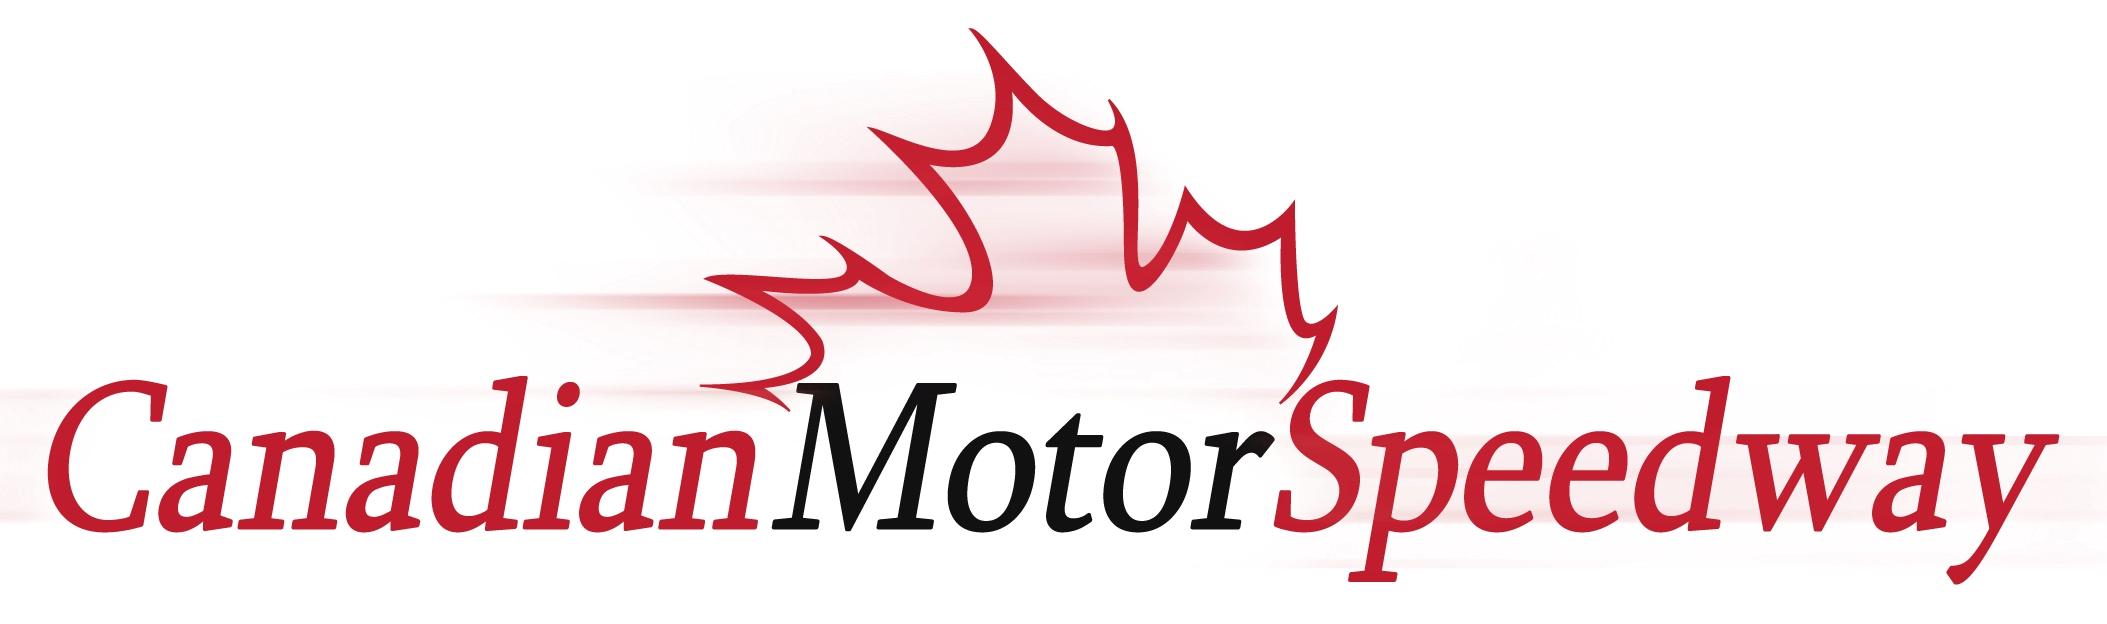 File:Canadian Motor Speedway White.jpg - Wikimedia Commons